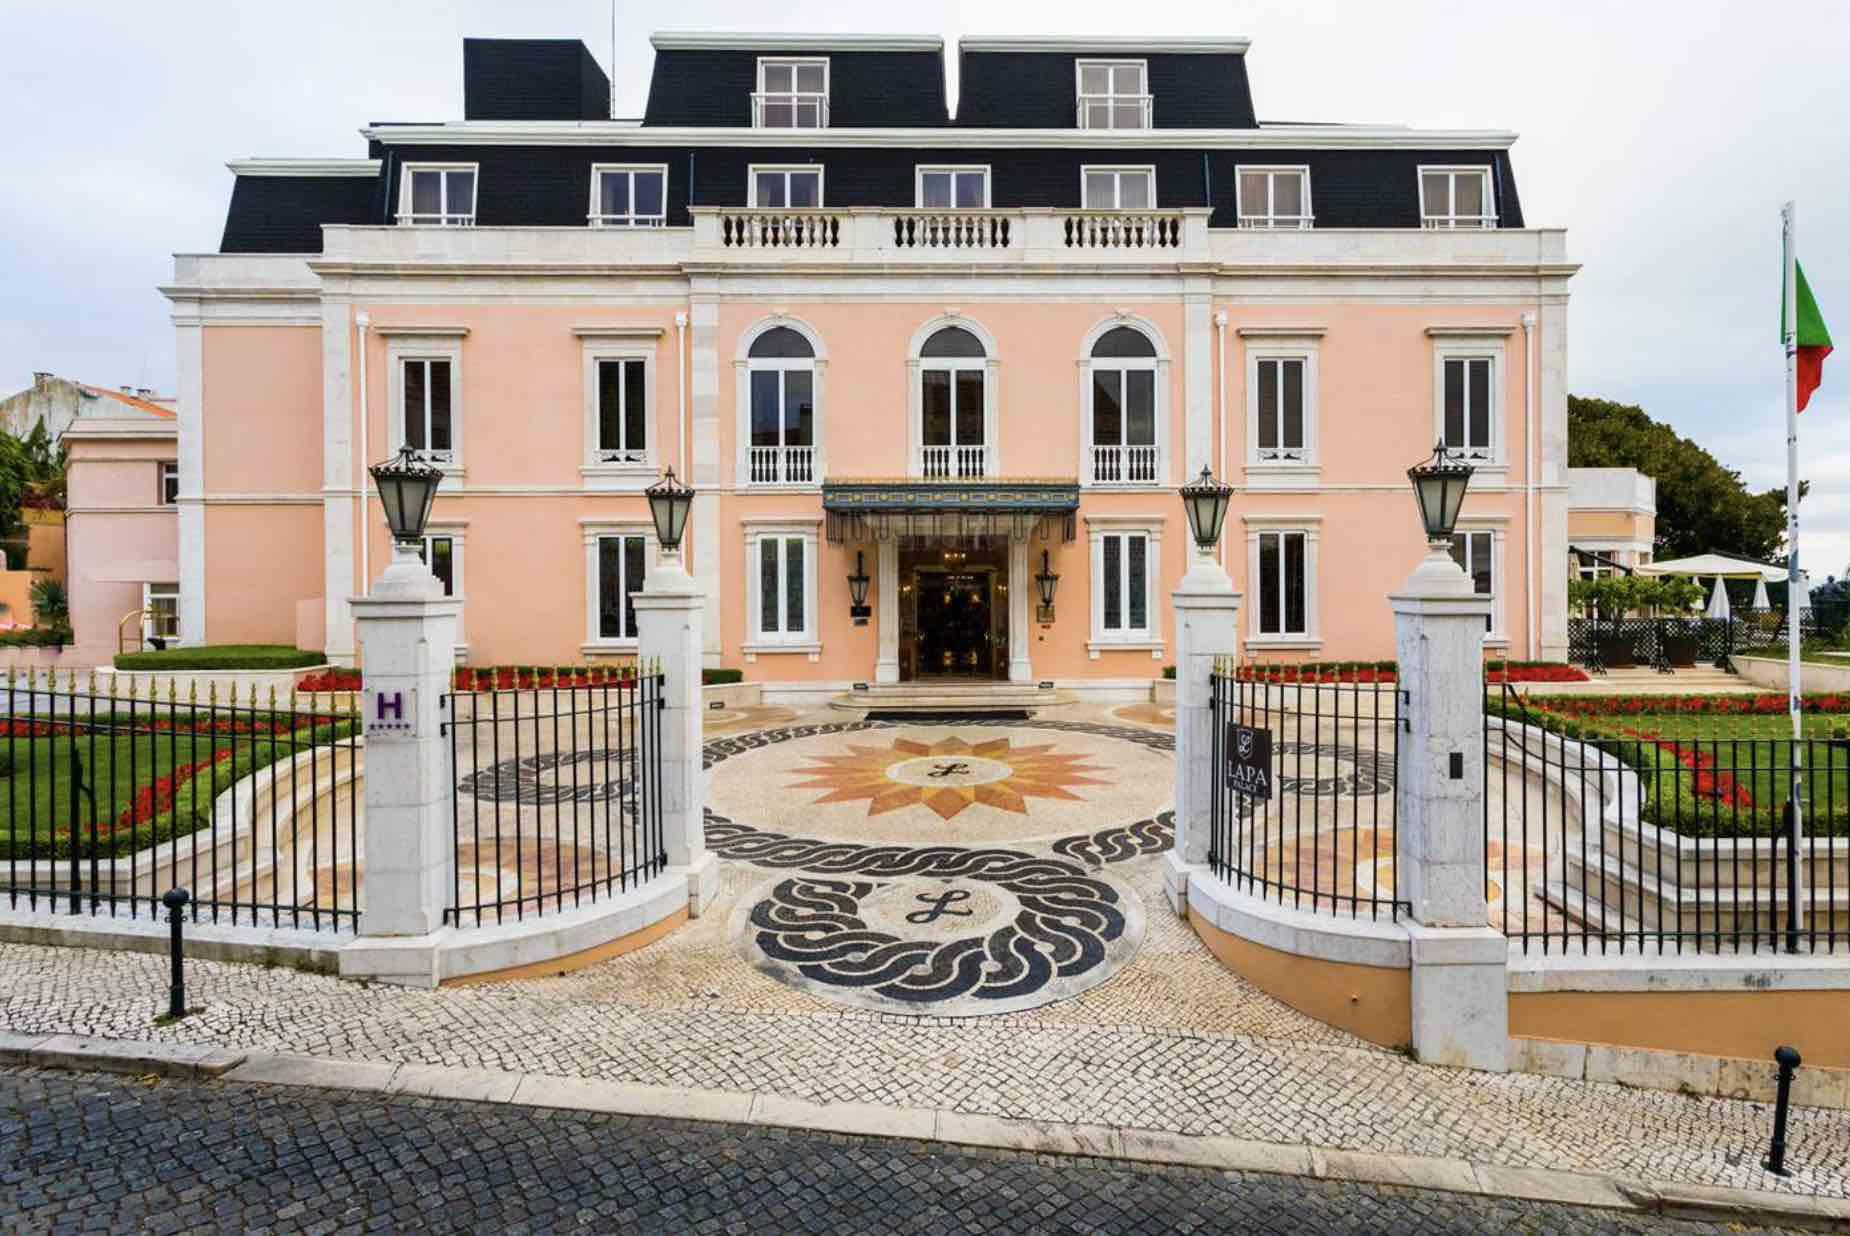 Olissippo Lapa Palace unique Lisbon Hotels palatial exterior